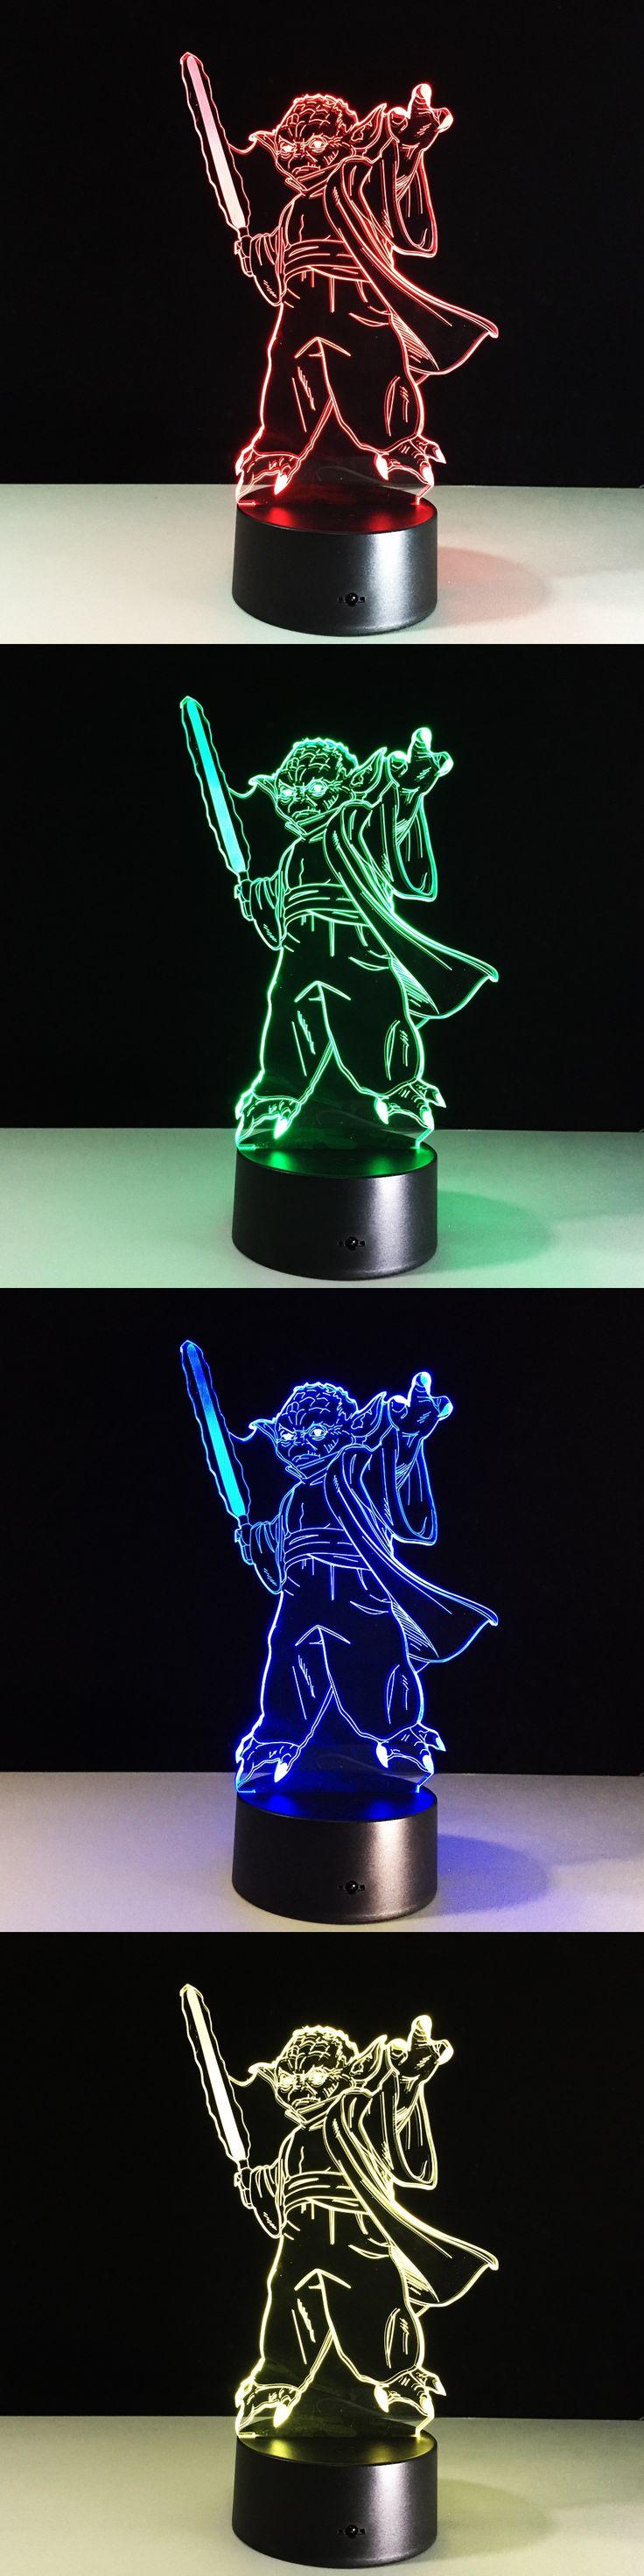 Star Wars Master Yoda 3D Led Light Star Wars Visual Night Lights Acrylic USB LED Creative 3D Lighting Lamp For Chrismas